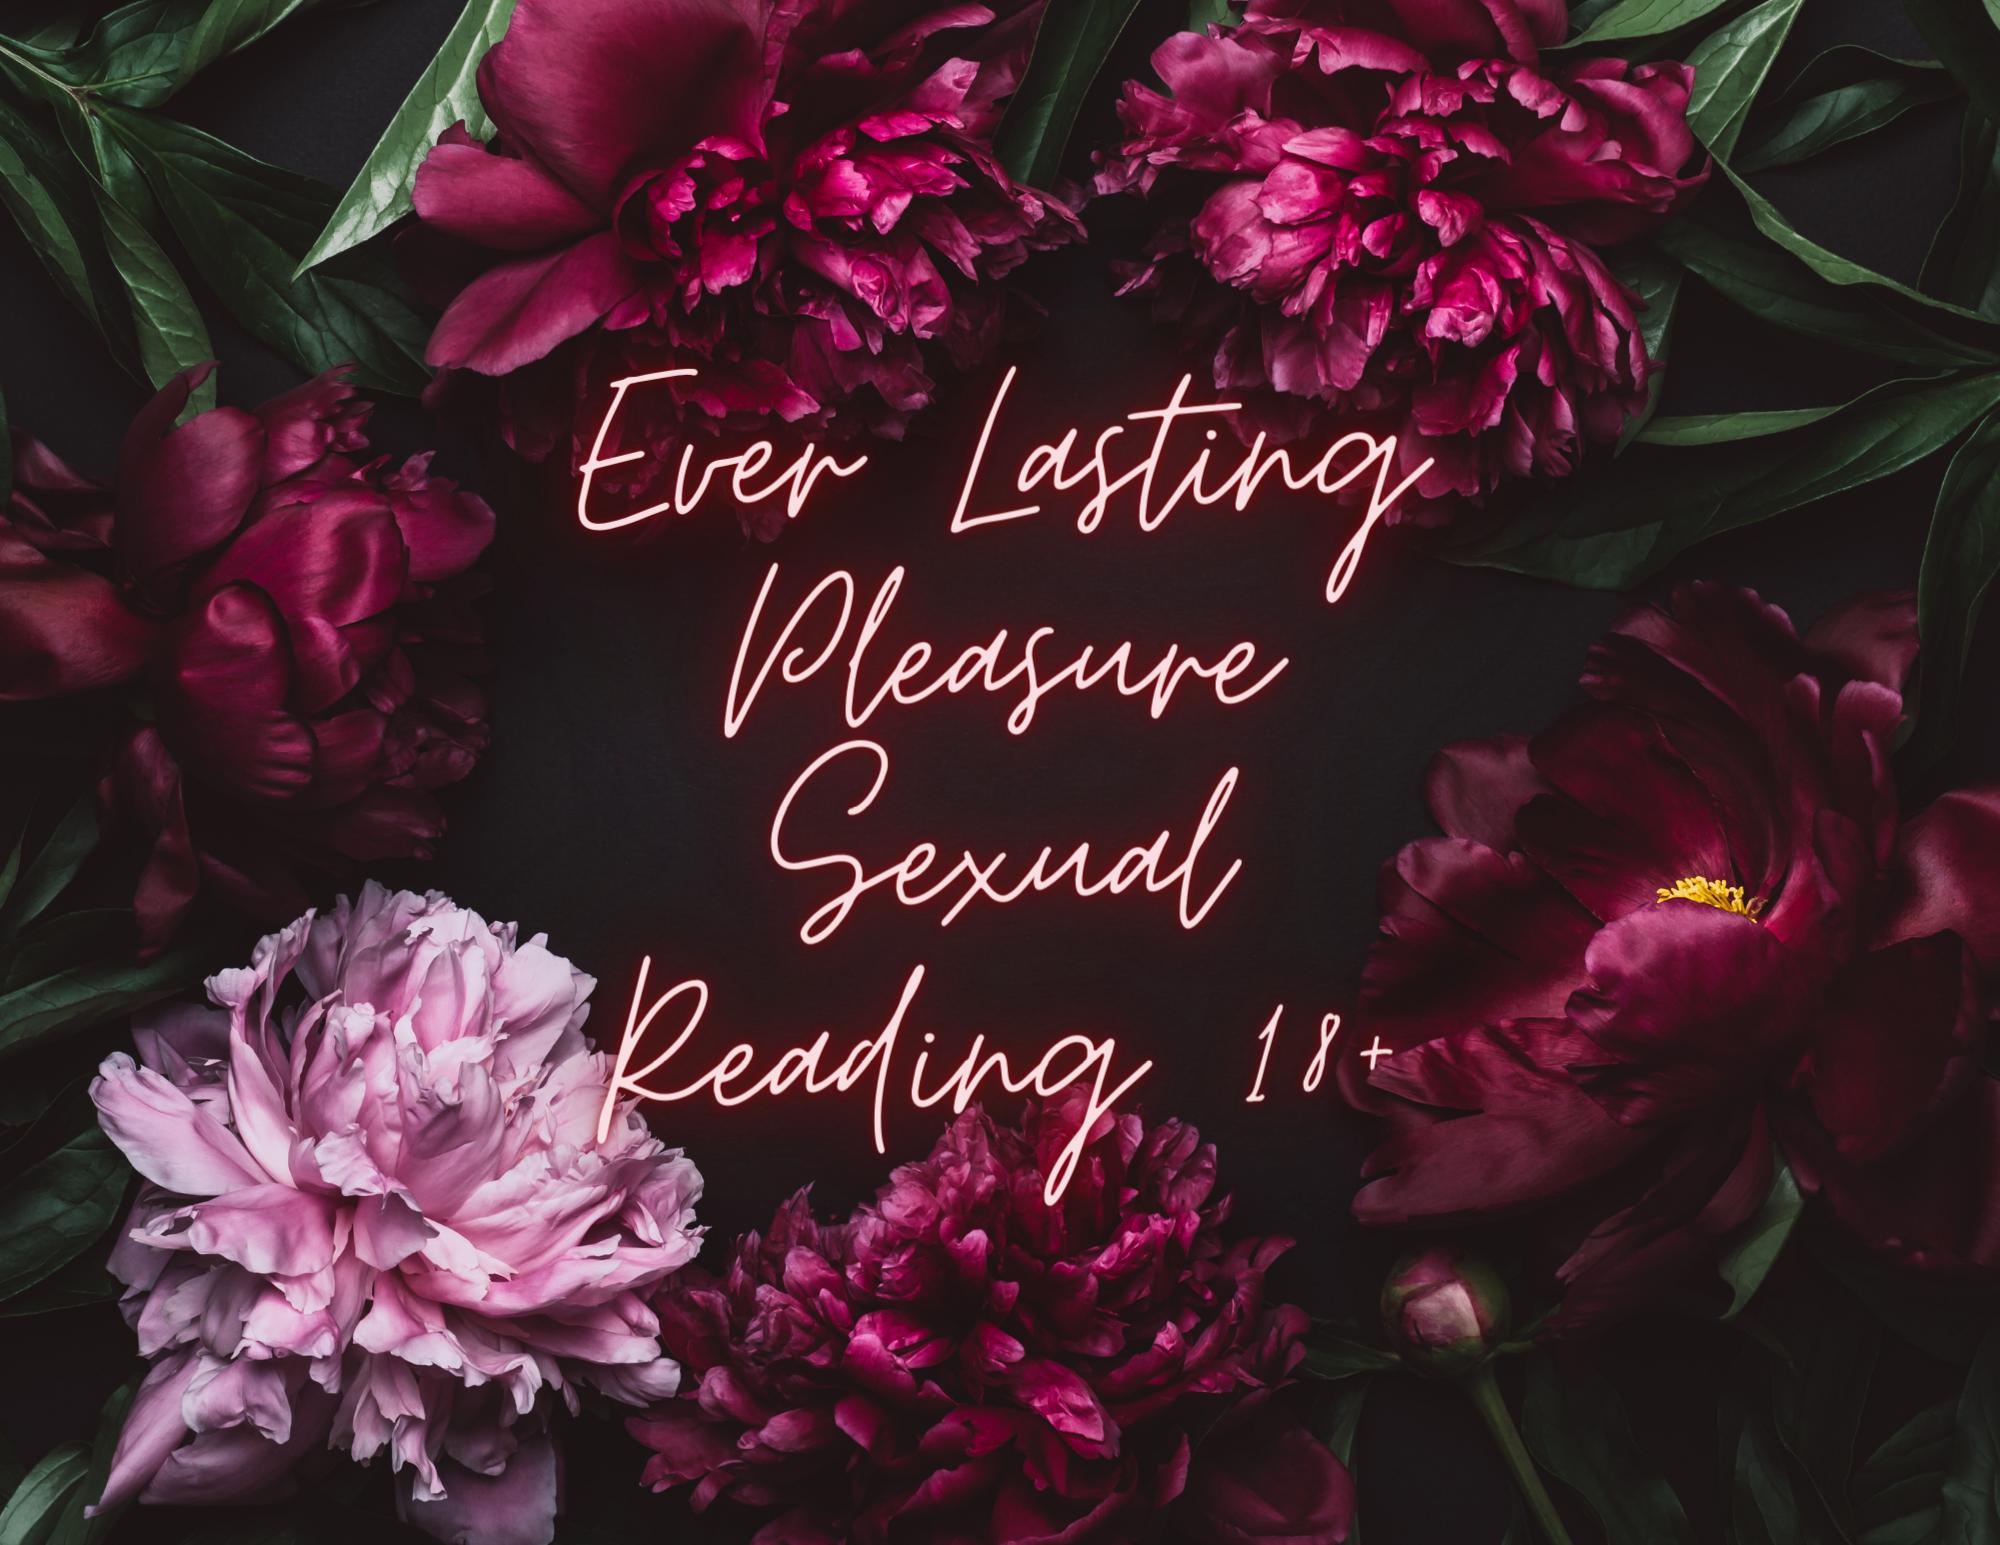 Ever Lasting Pleasure Sexual Reading 18+